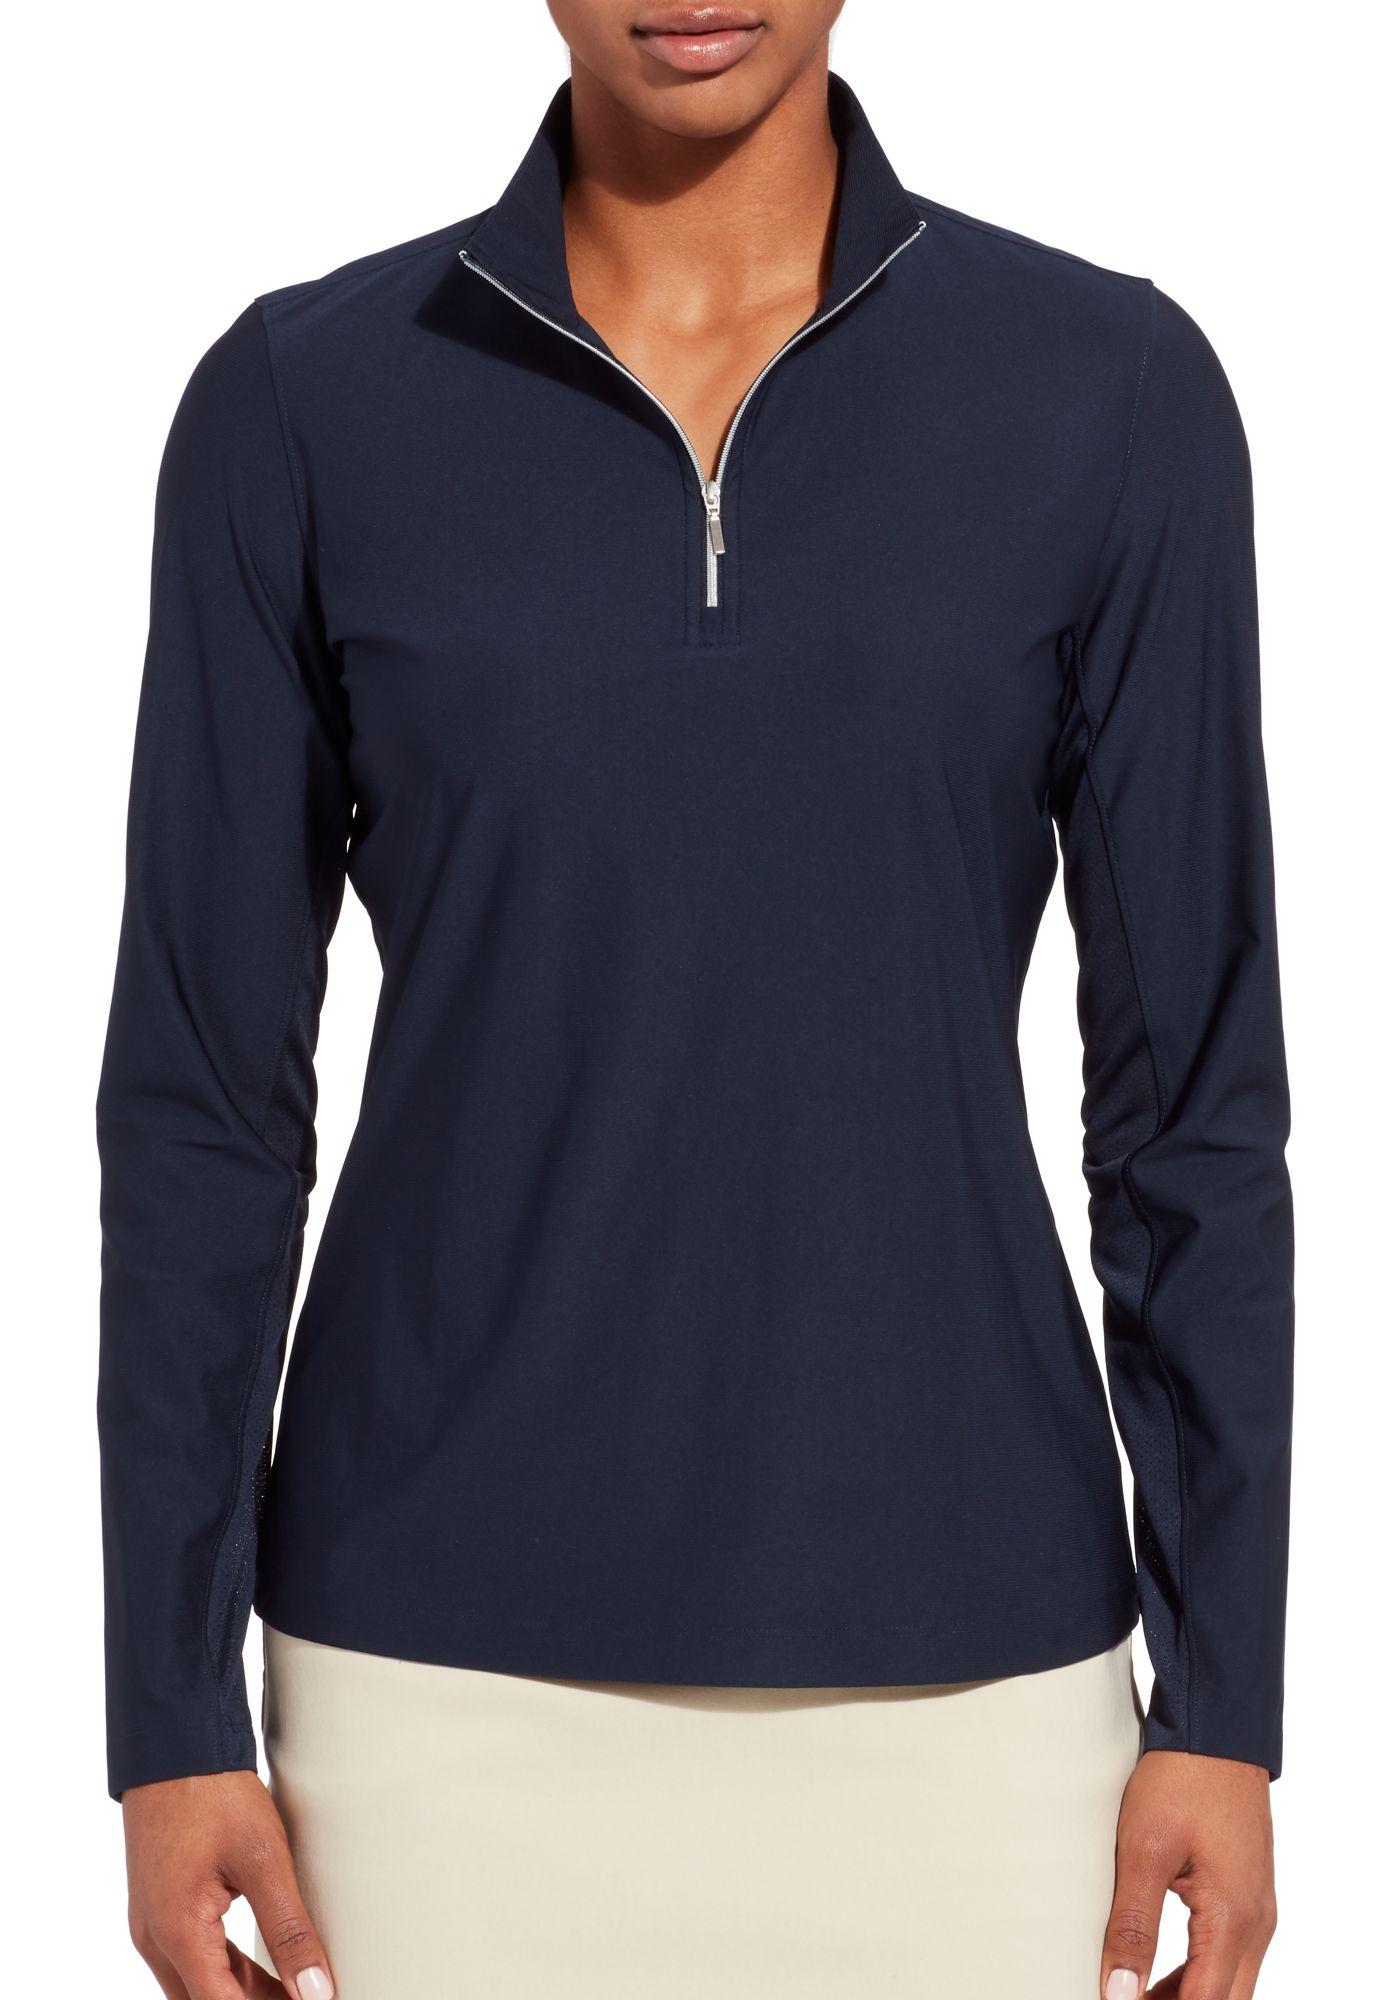 Lady Hagen Women's UV ¼-Zip Golf Pullover